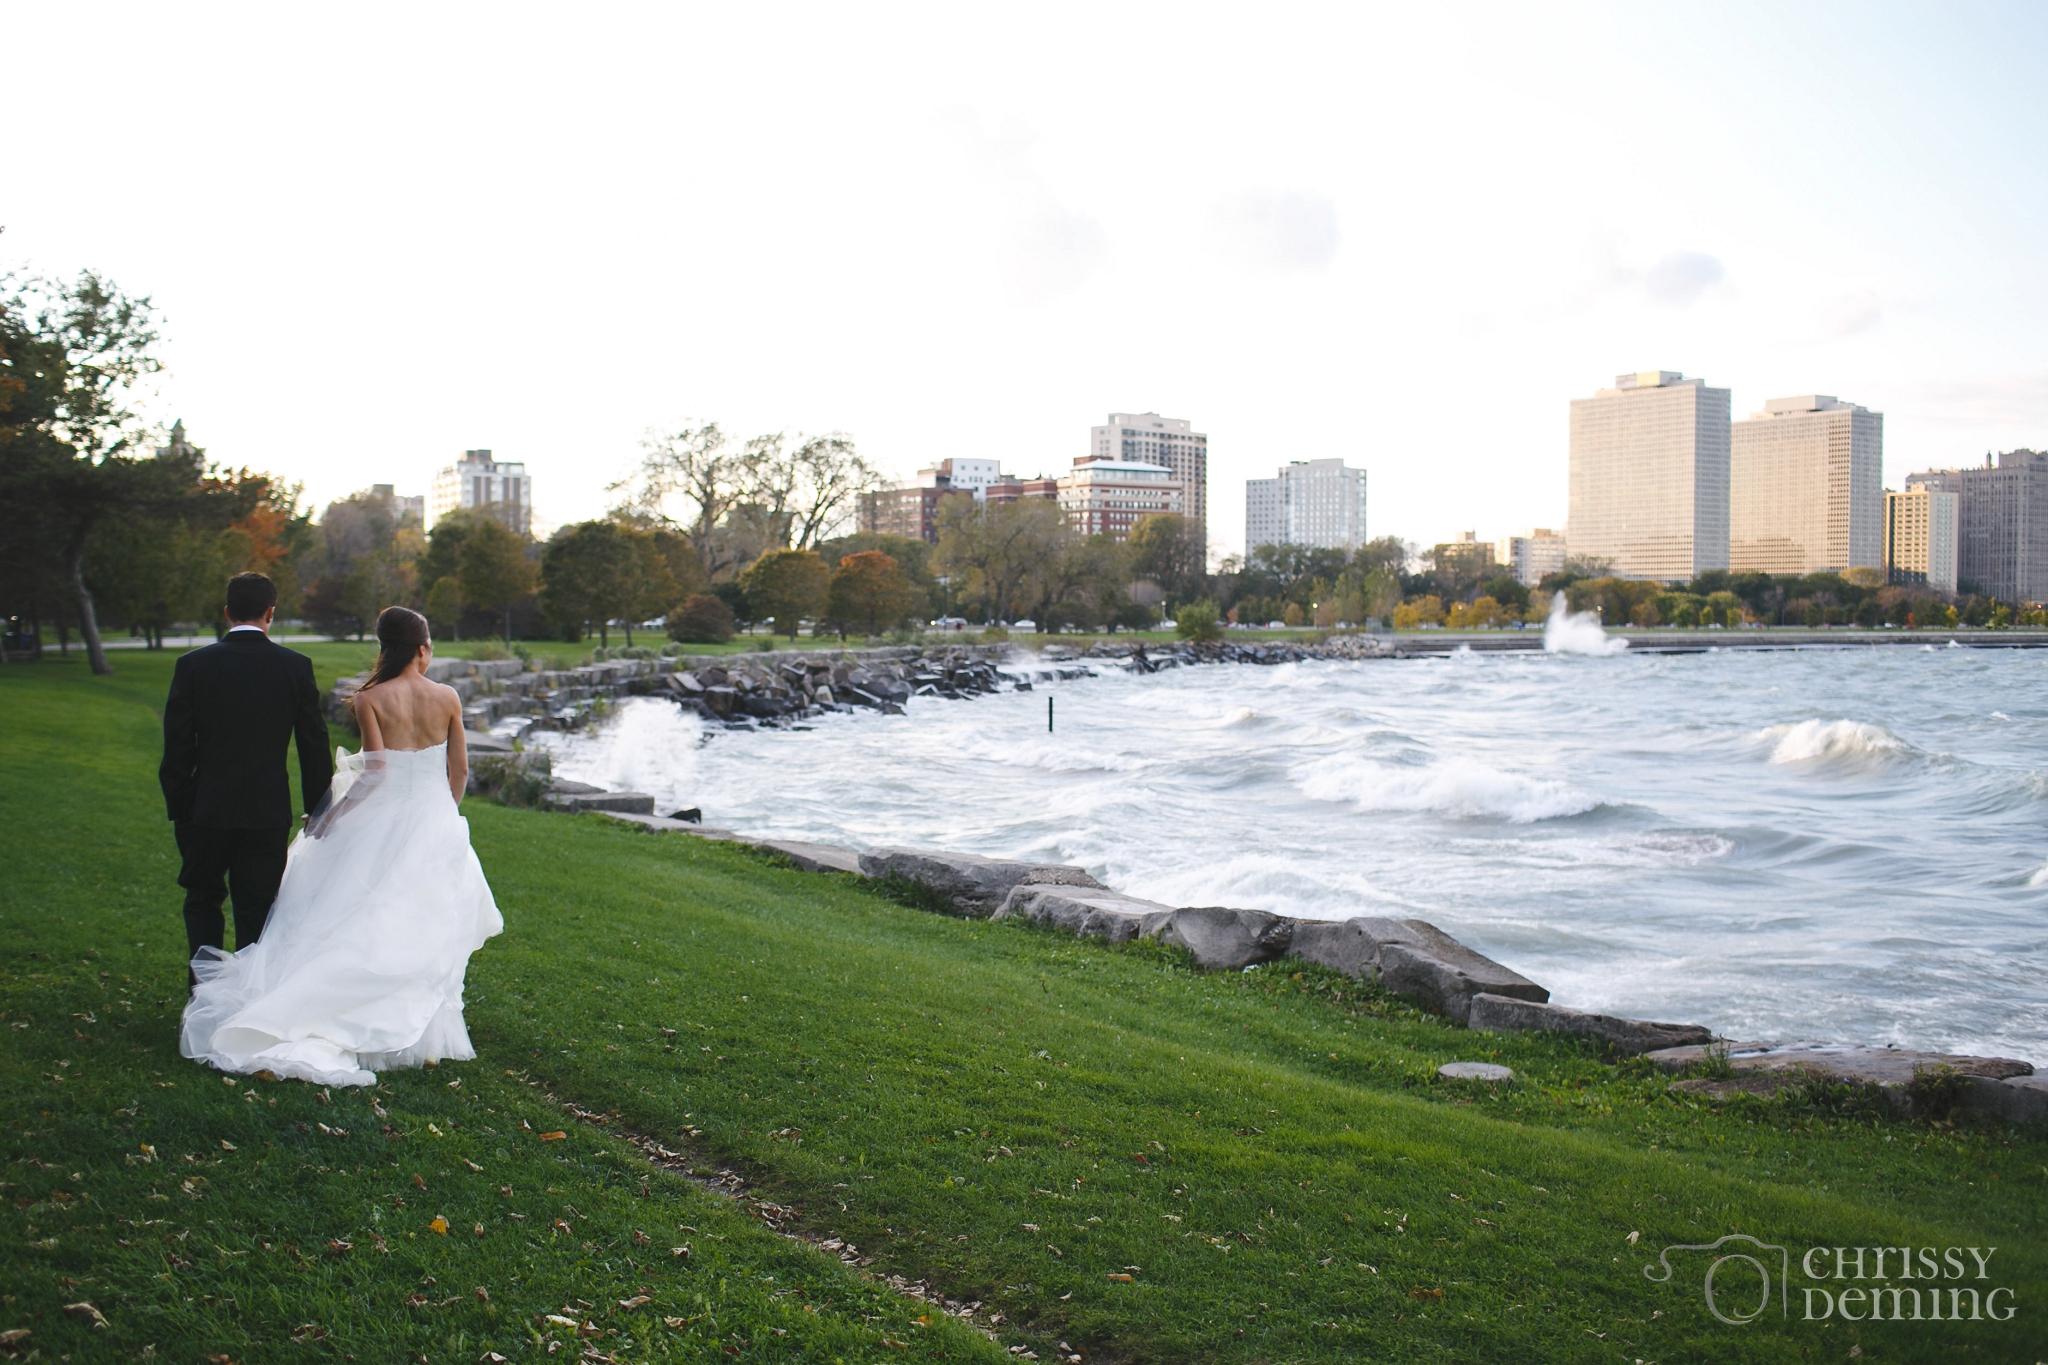 promontory_point_chicago_wedding_photography_0022.jpg